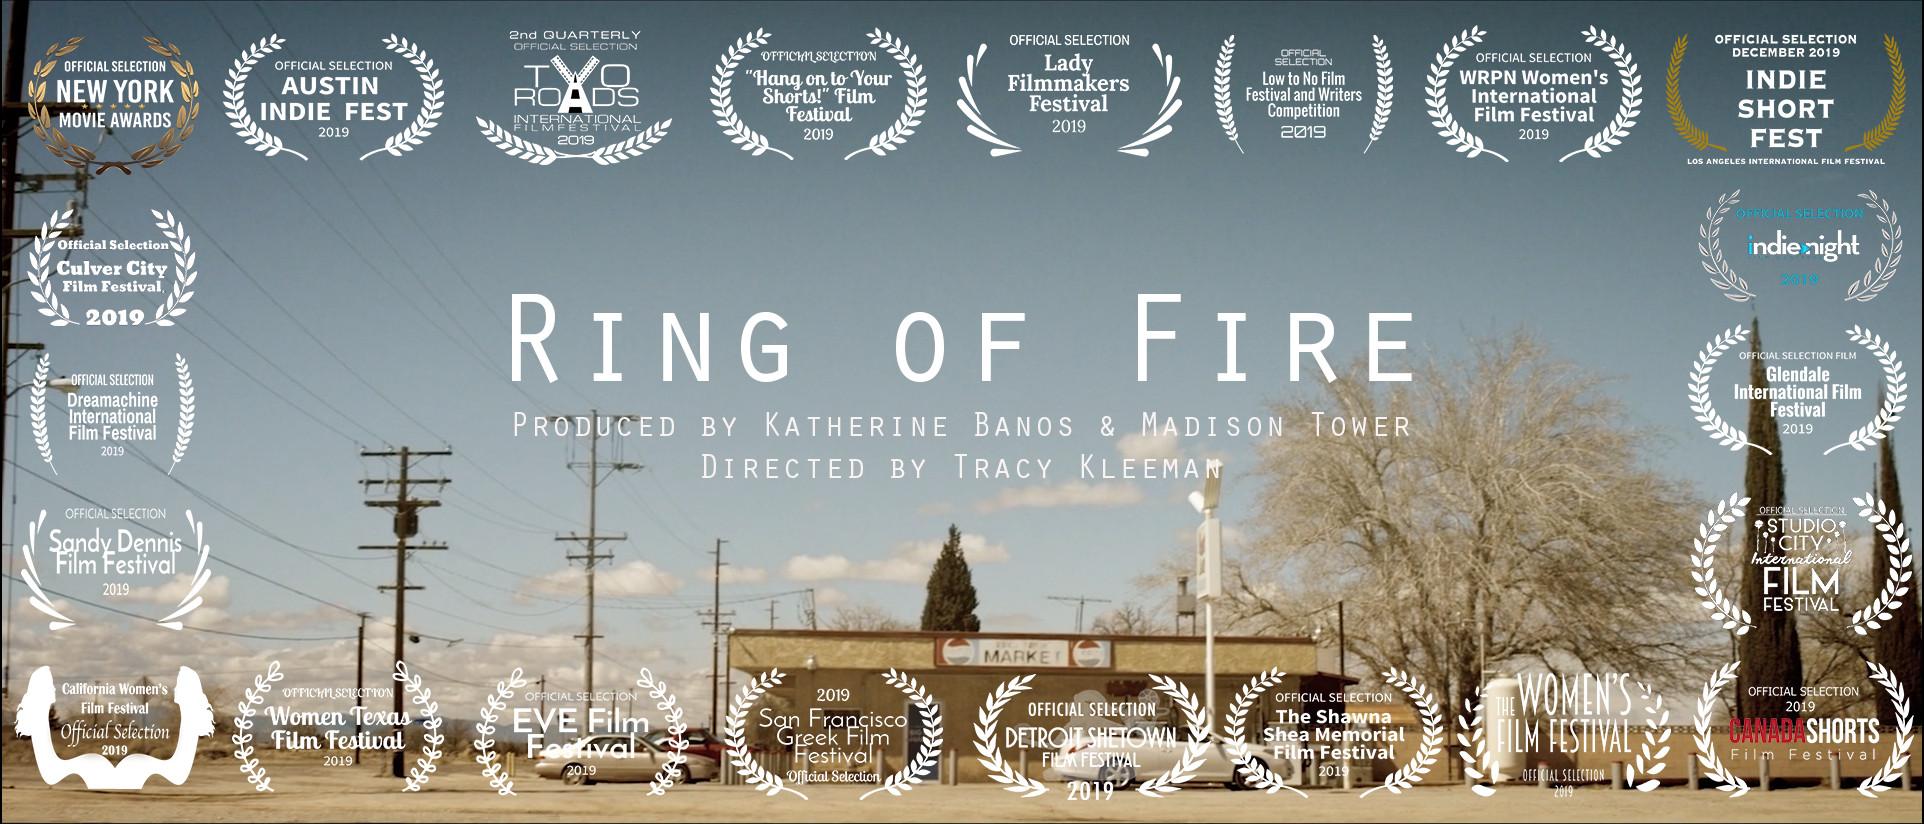 TWO ROADS INTERNATIONAL FILM FESTIVA